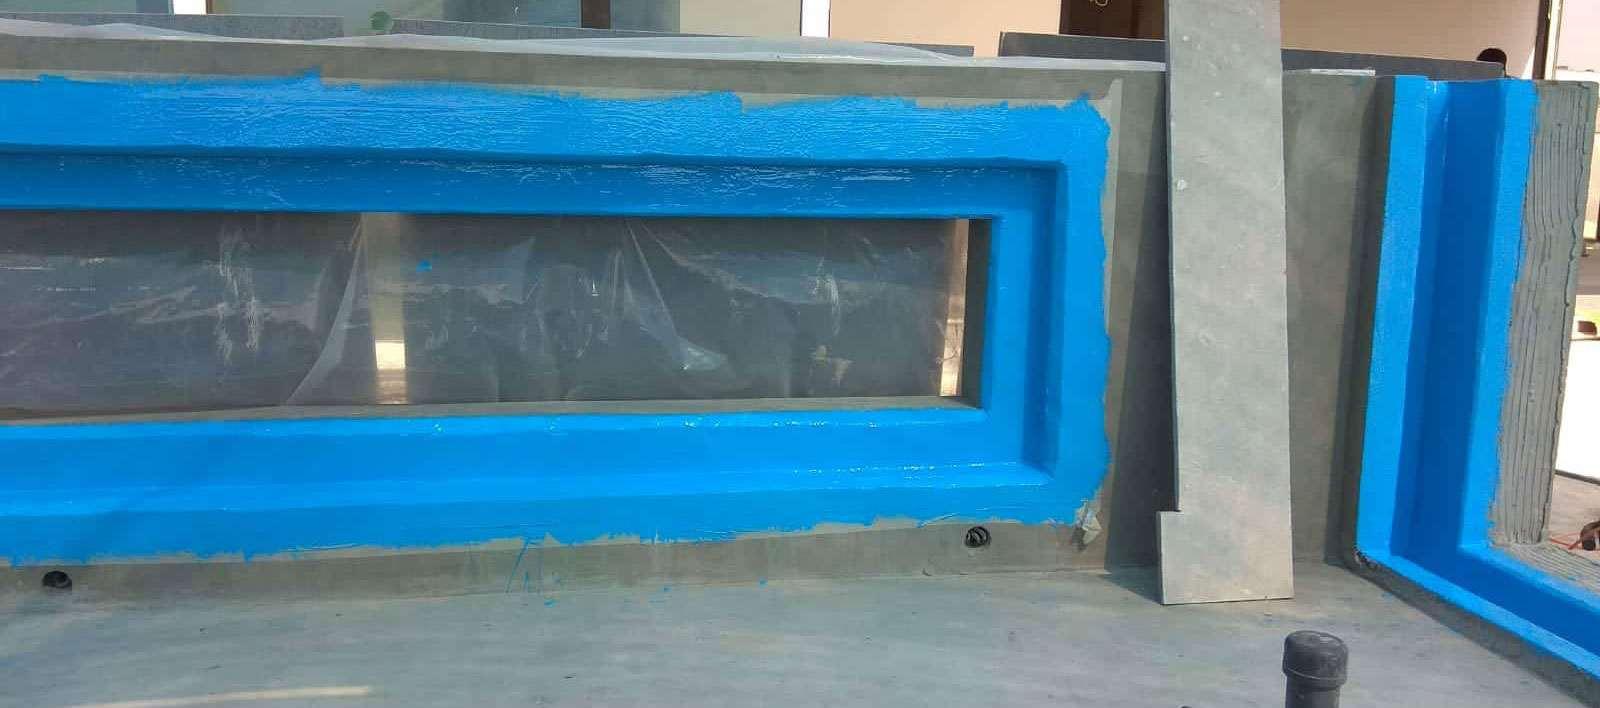 Side Pool Windows - Swimming Pool Panels | AQUALIFE